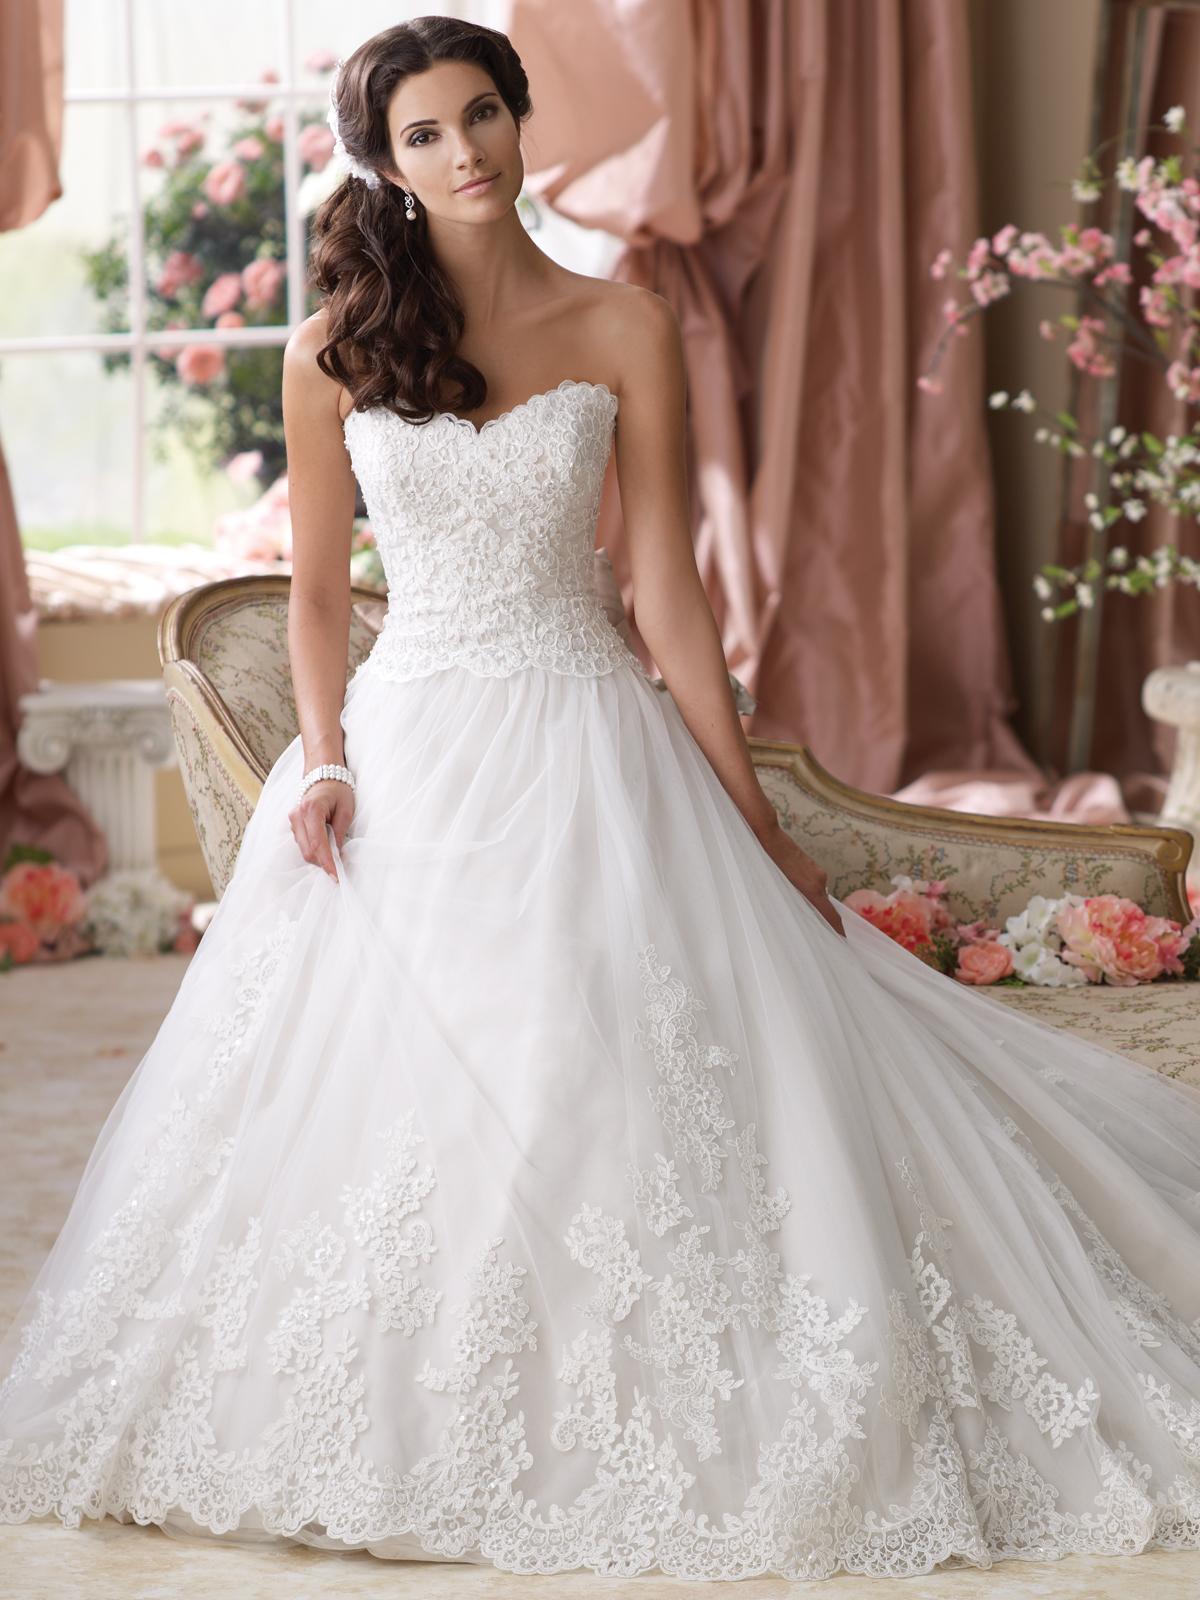 Wedding Dresses For   Sunshine Coast : Patmore sunshine coast wedding dresses